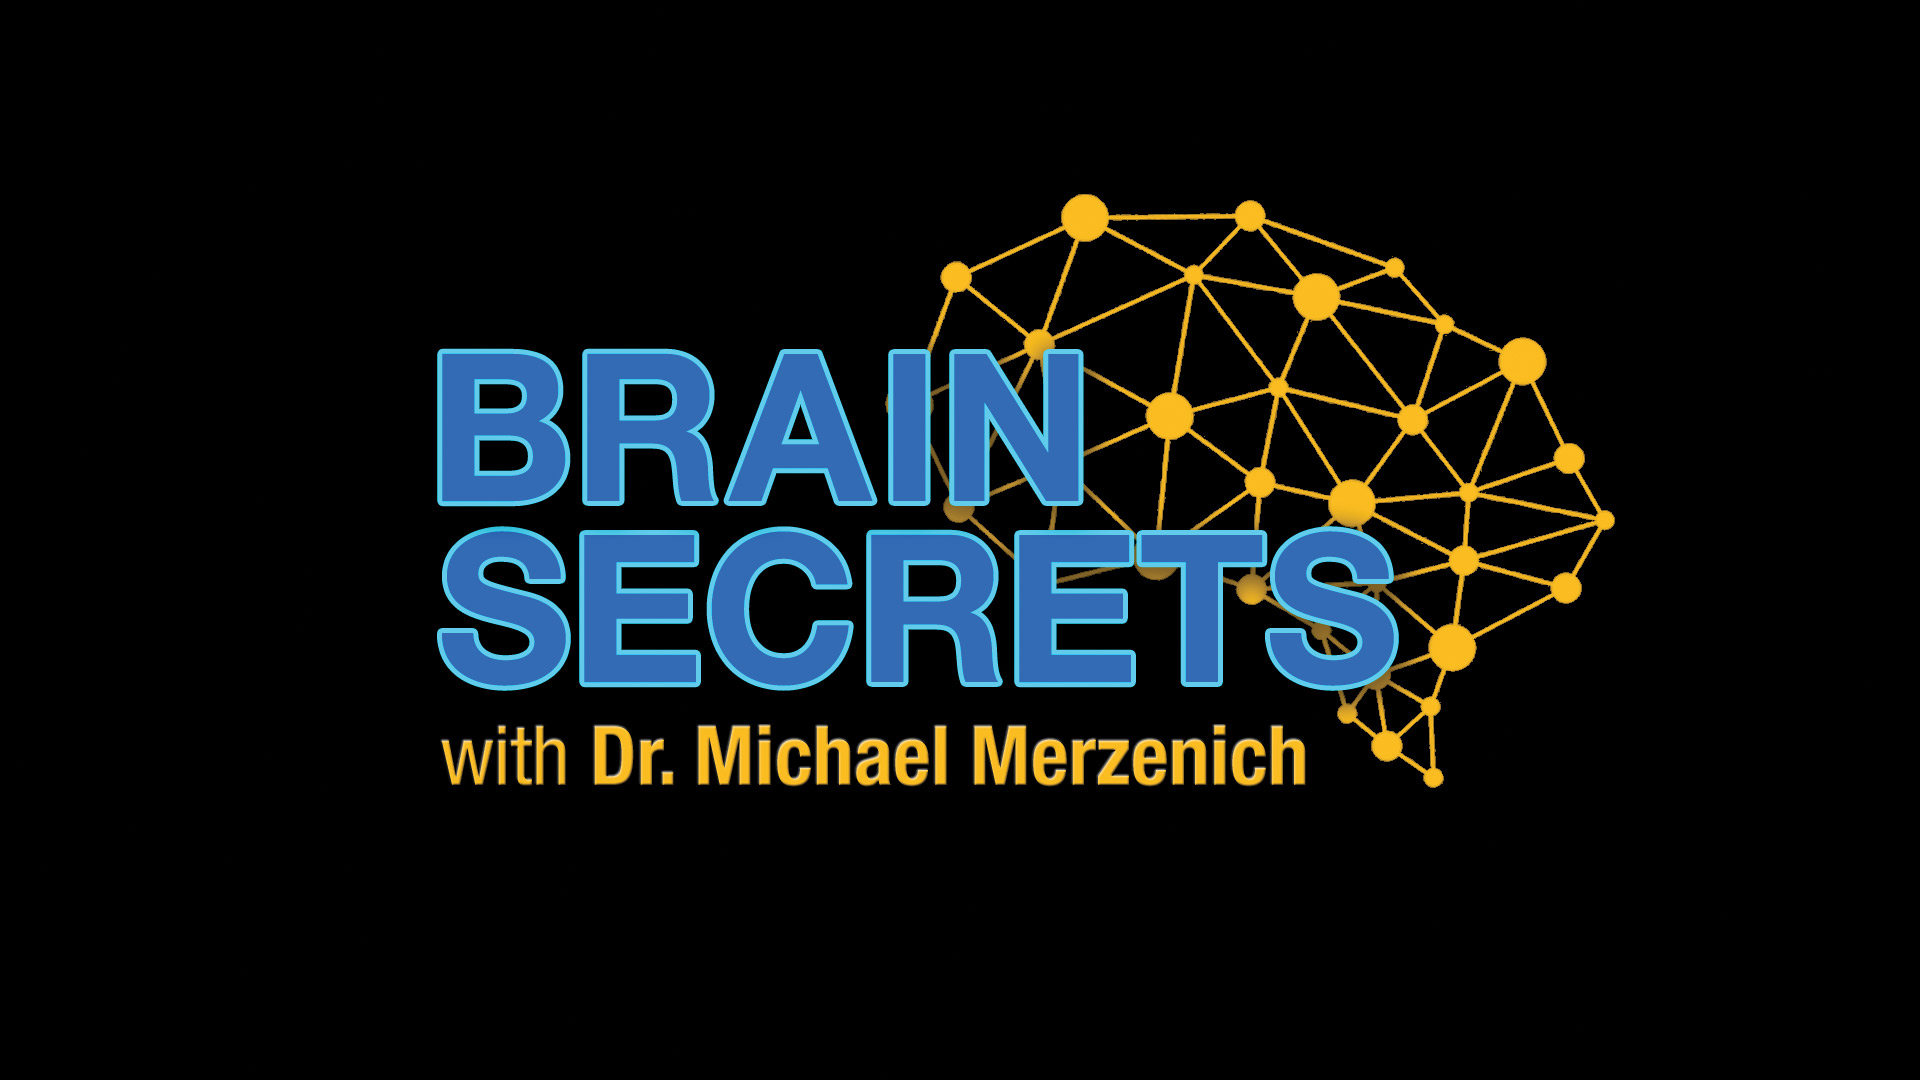 Brain Secrets with Dr. Michael Merzenich